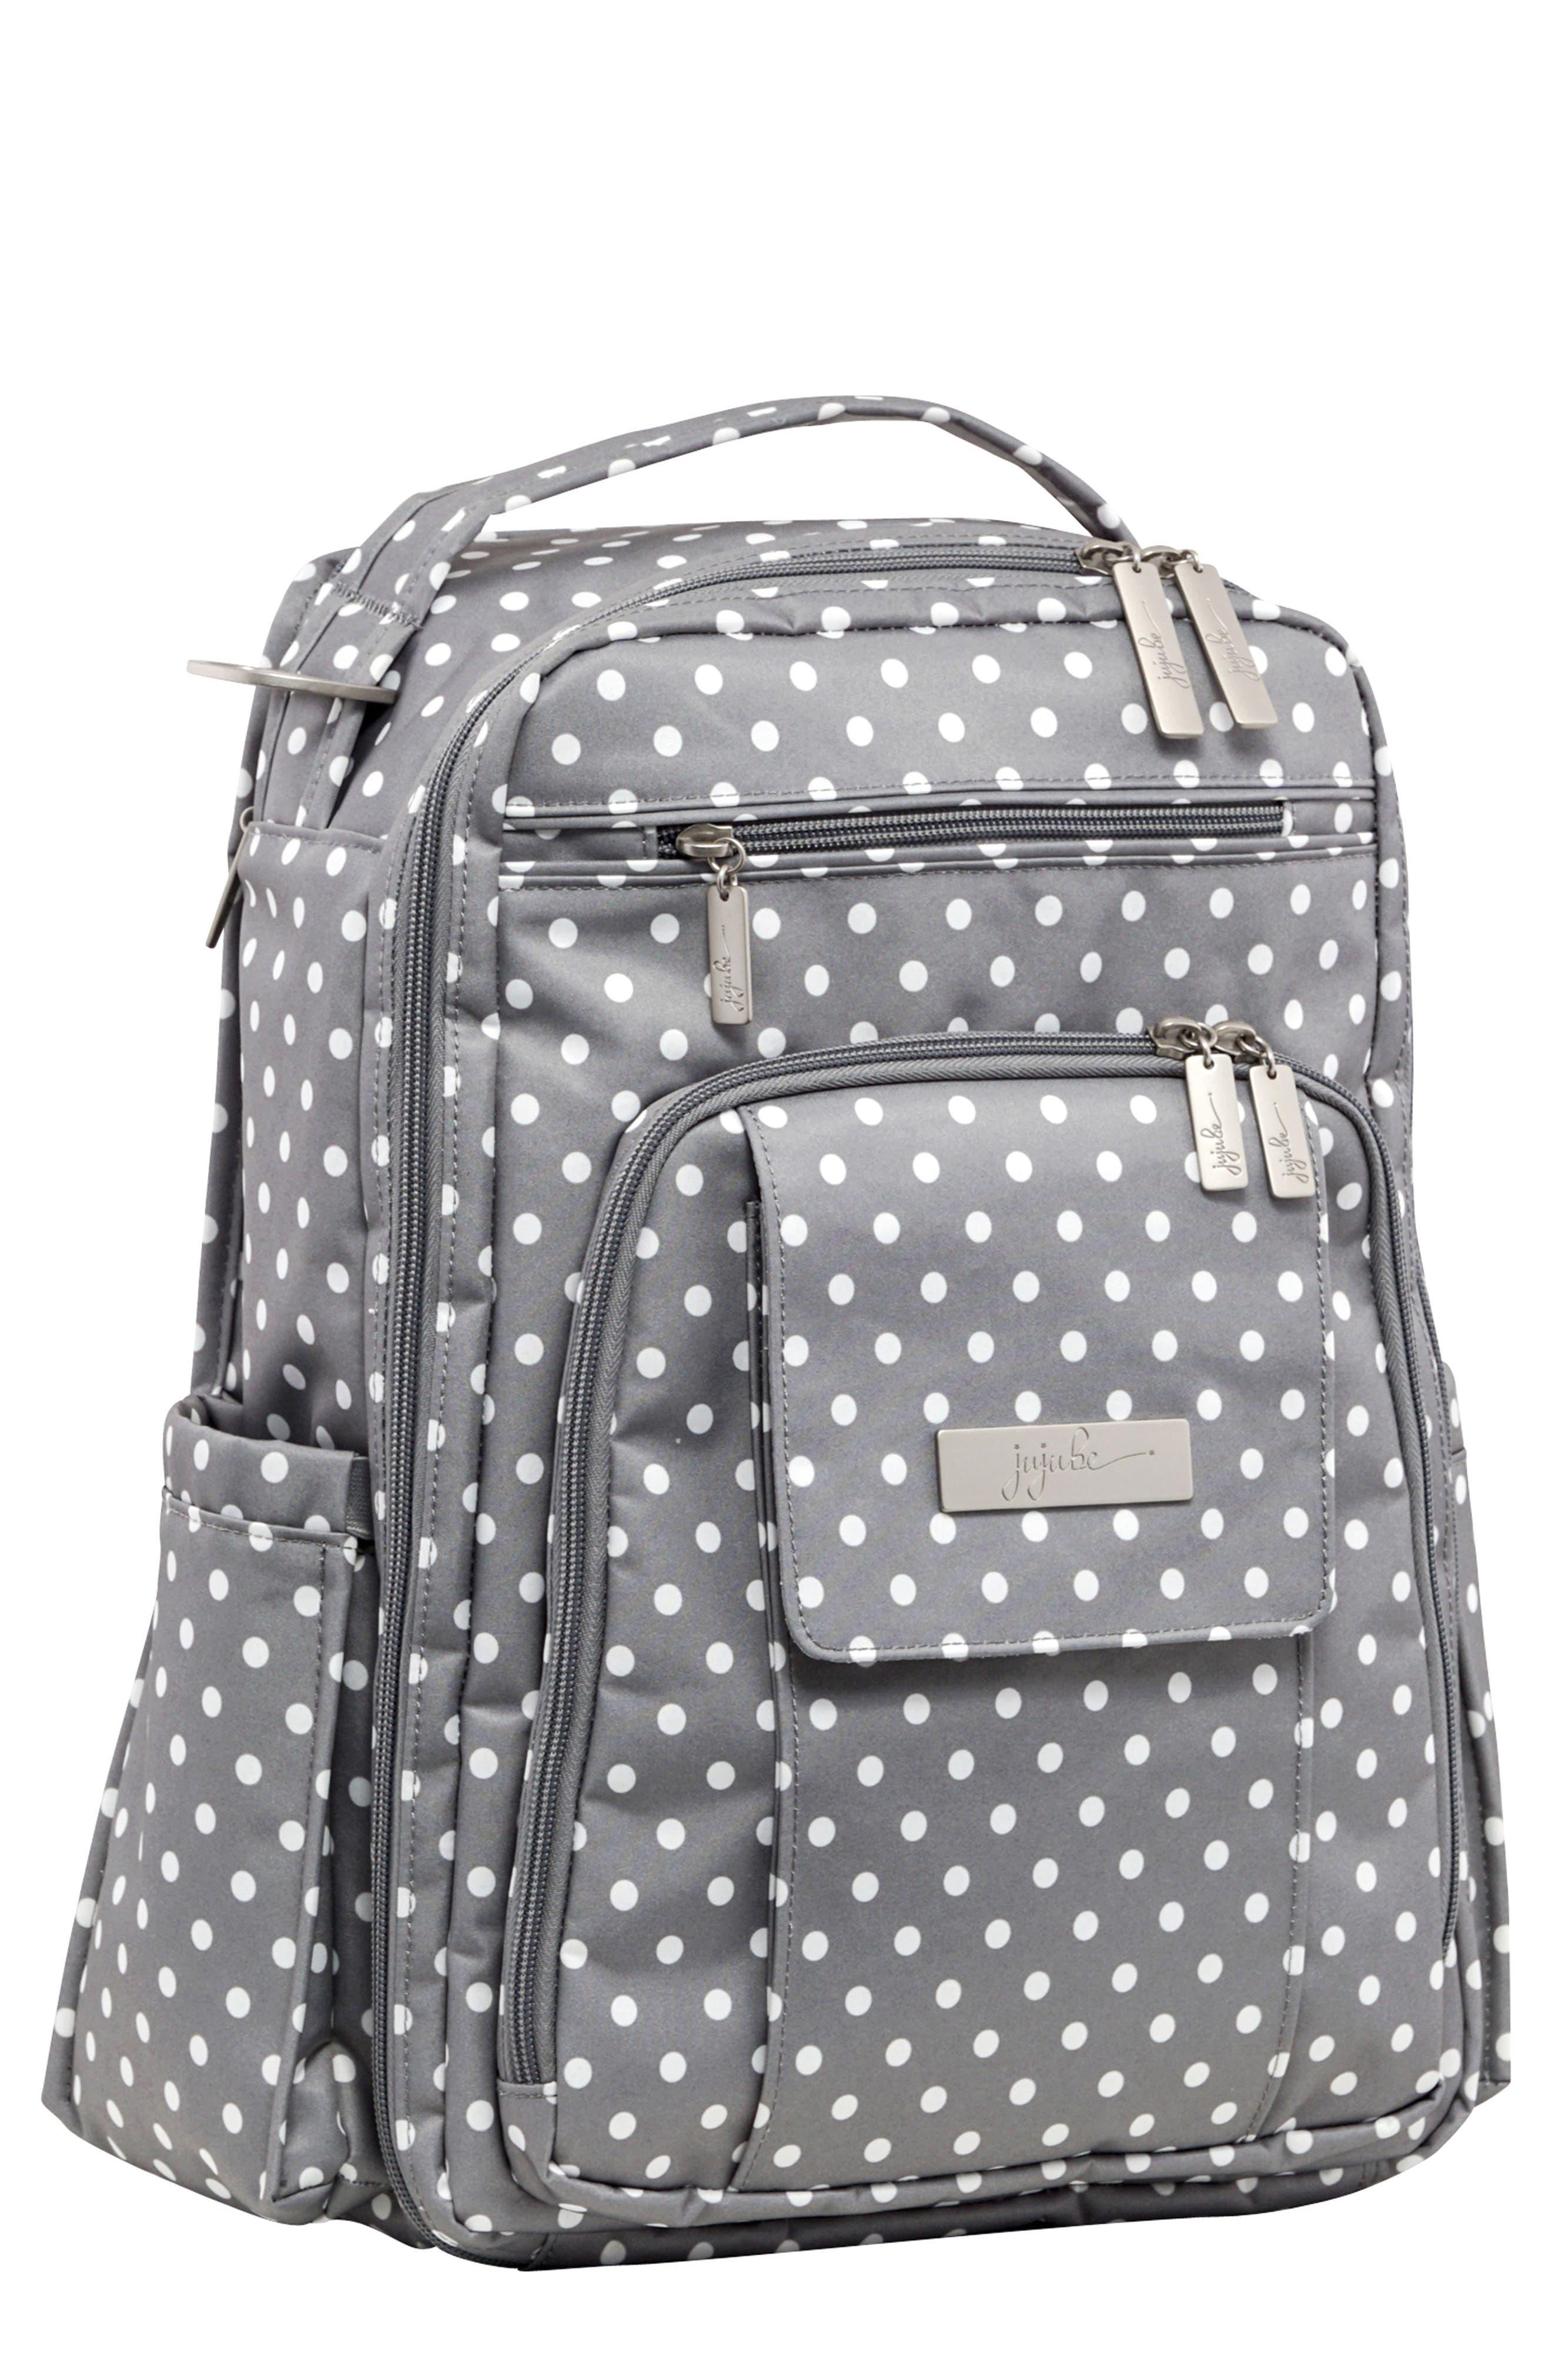 Ju-Ju-Be 'Be Right Back' Diaper Backpack